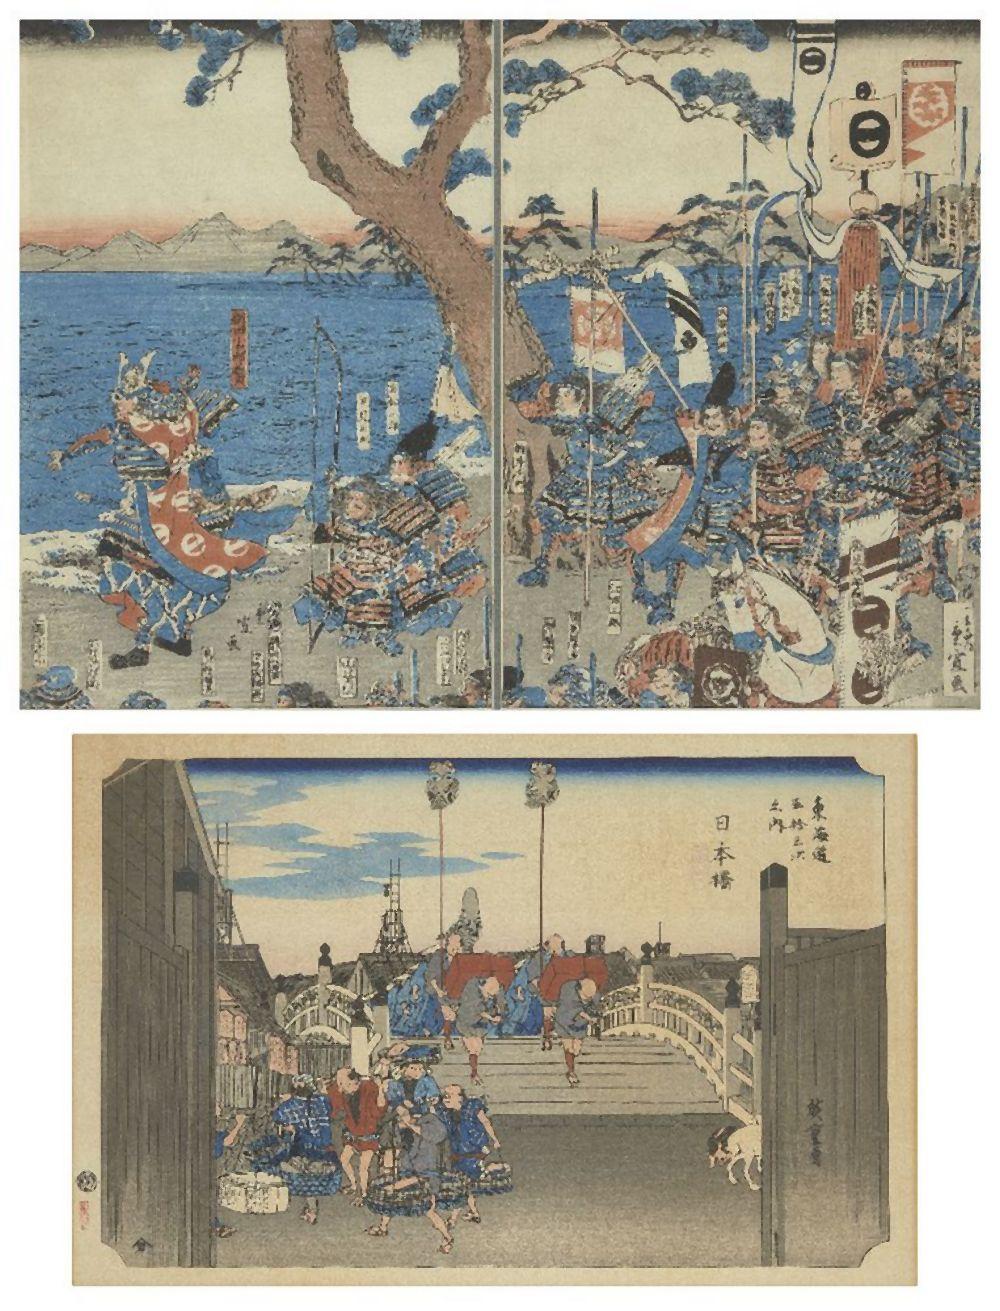 Utagawa Hiroshige II, Japanese 1826-1869, The Battle of Kamakura, Nitta Yoshida, 1853, woodblock pri